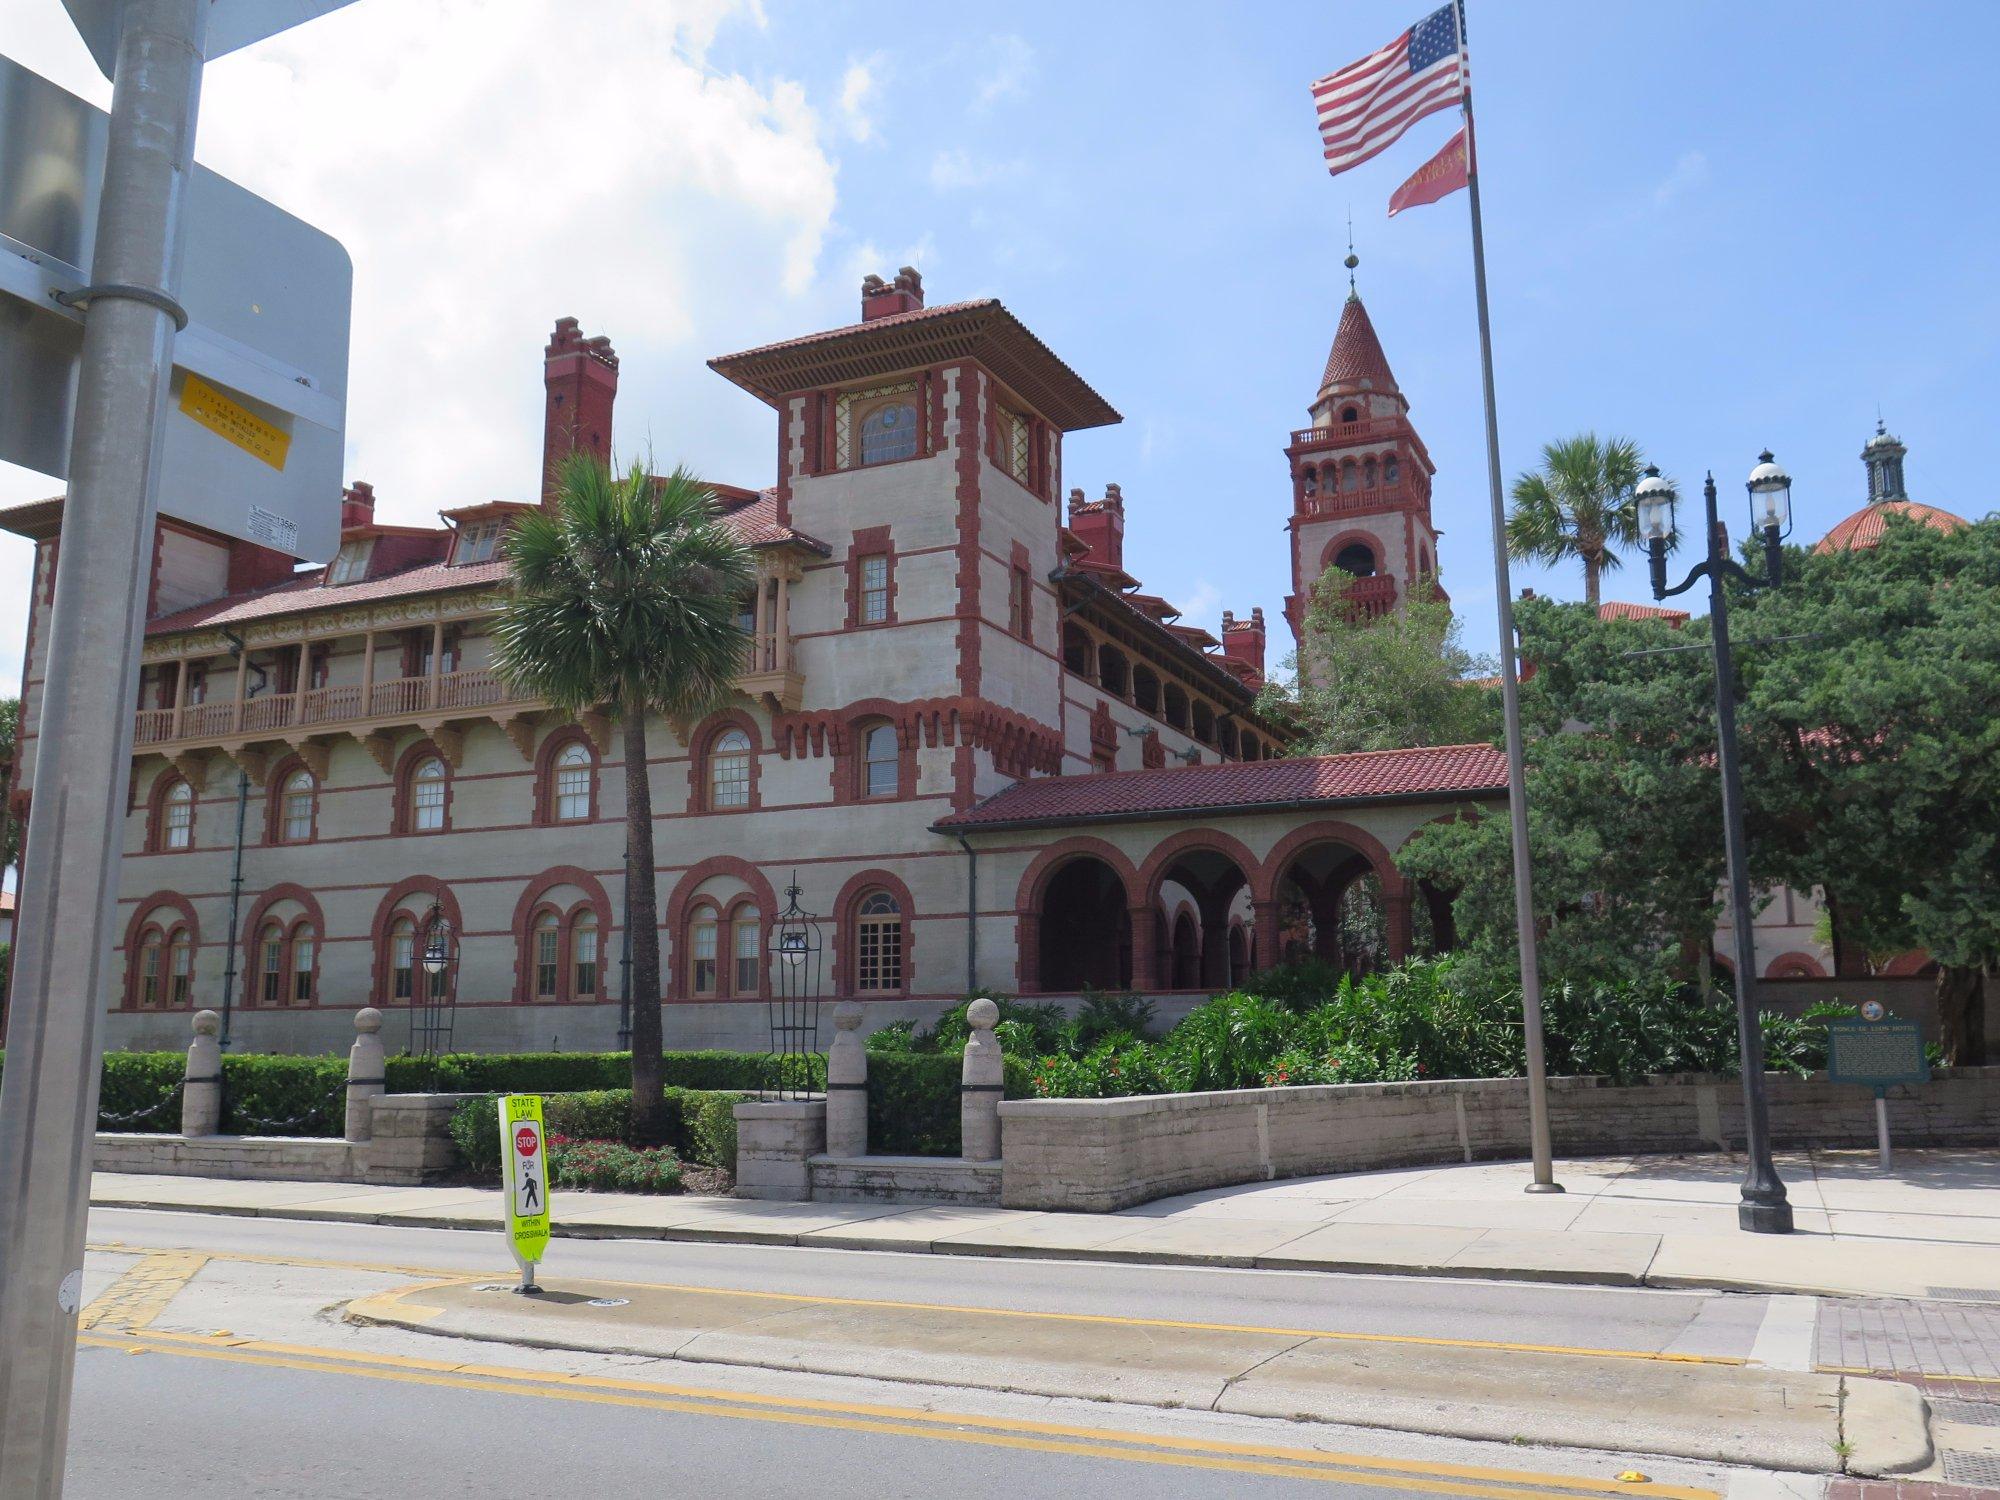 Saint Agustine, Florida bellisimo e historico no te lo pierdas